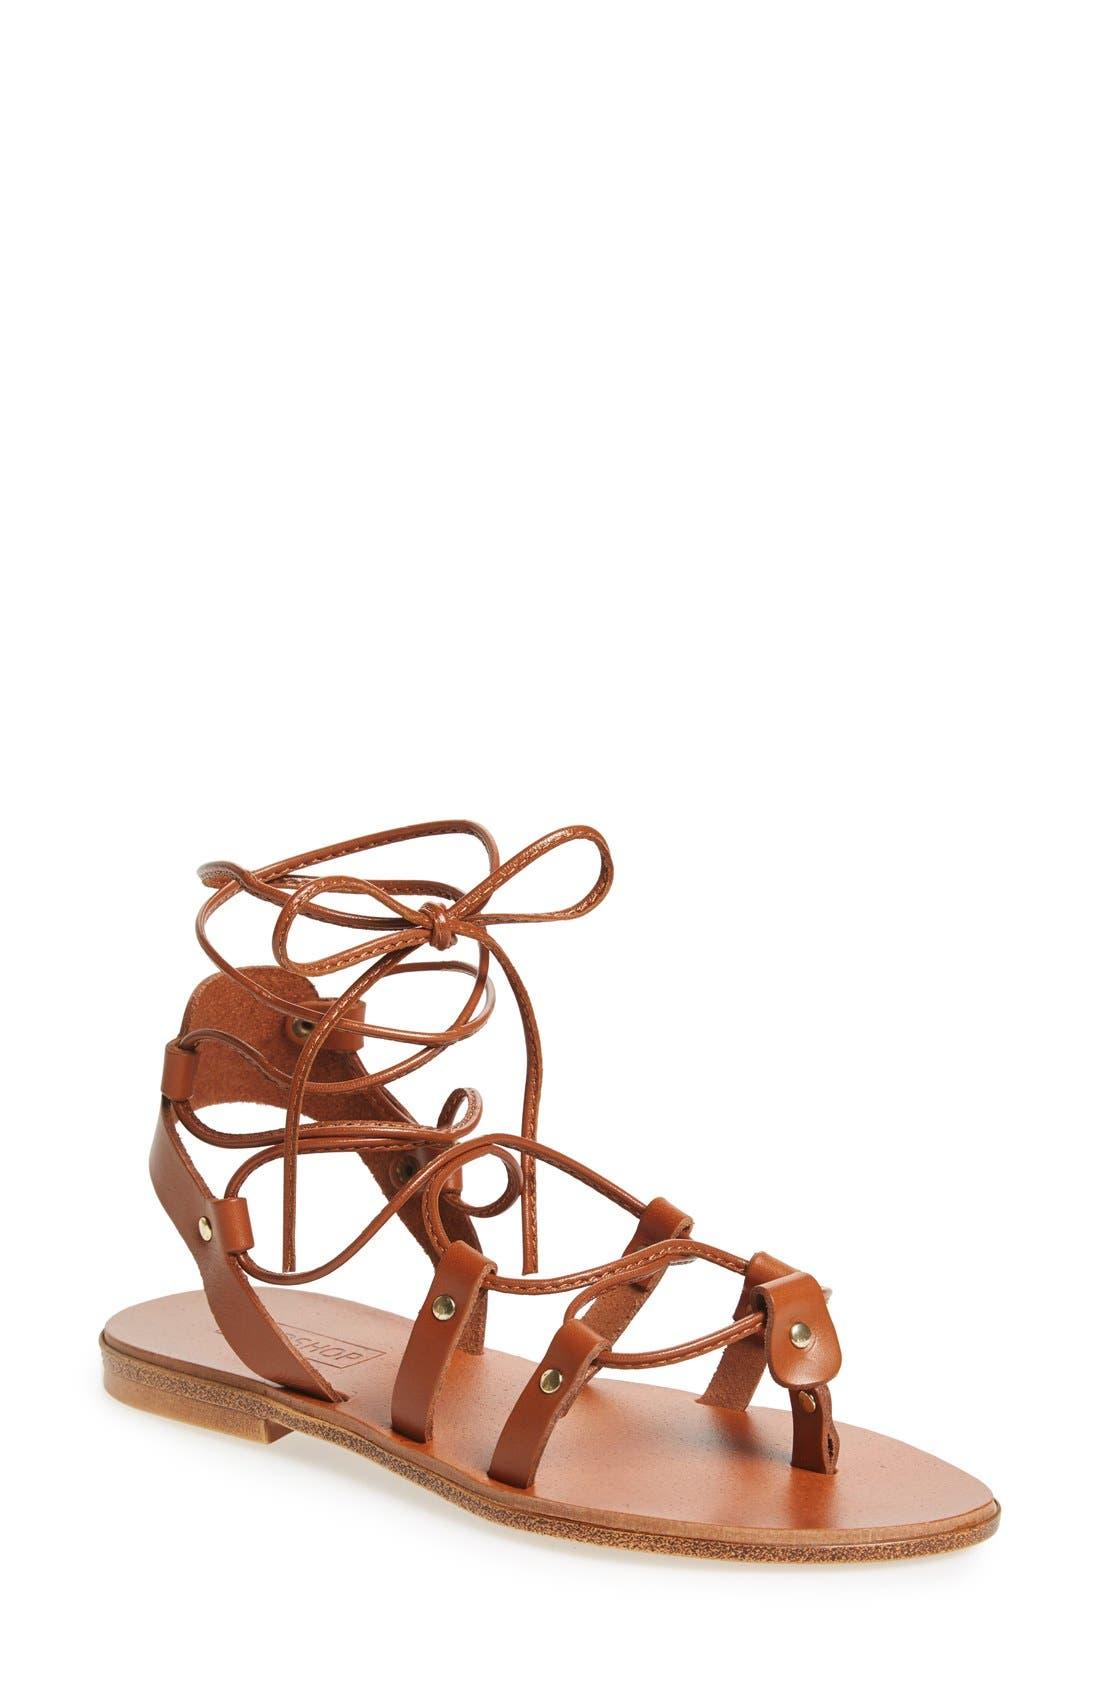 TOPSHOP 'Foxy' Ghillie Sandal